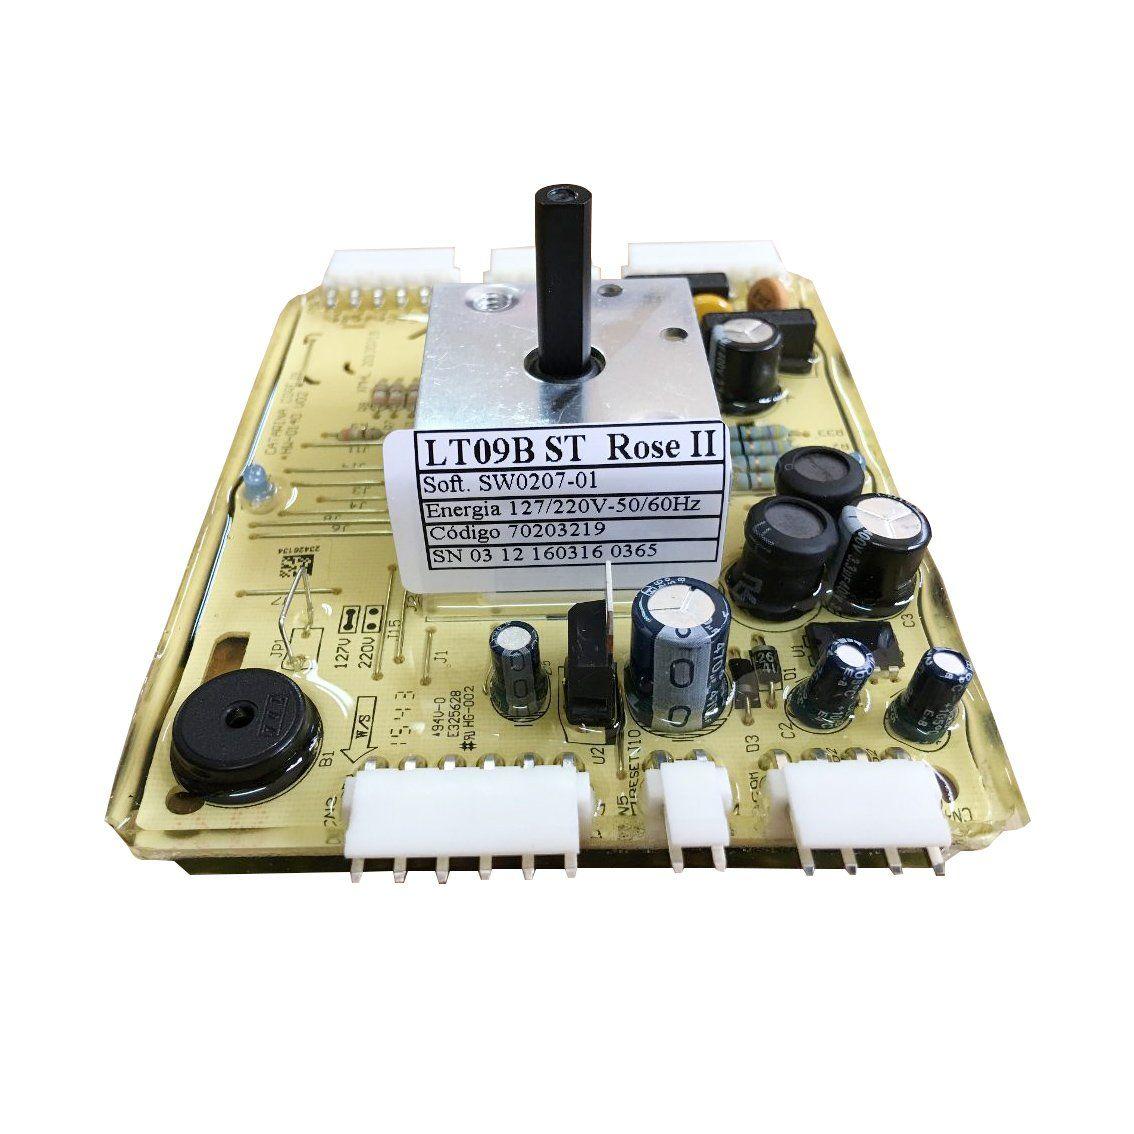 Placa De Potencia Lavadora Electrolux Lt09B 70203219